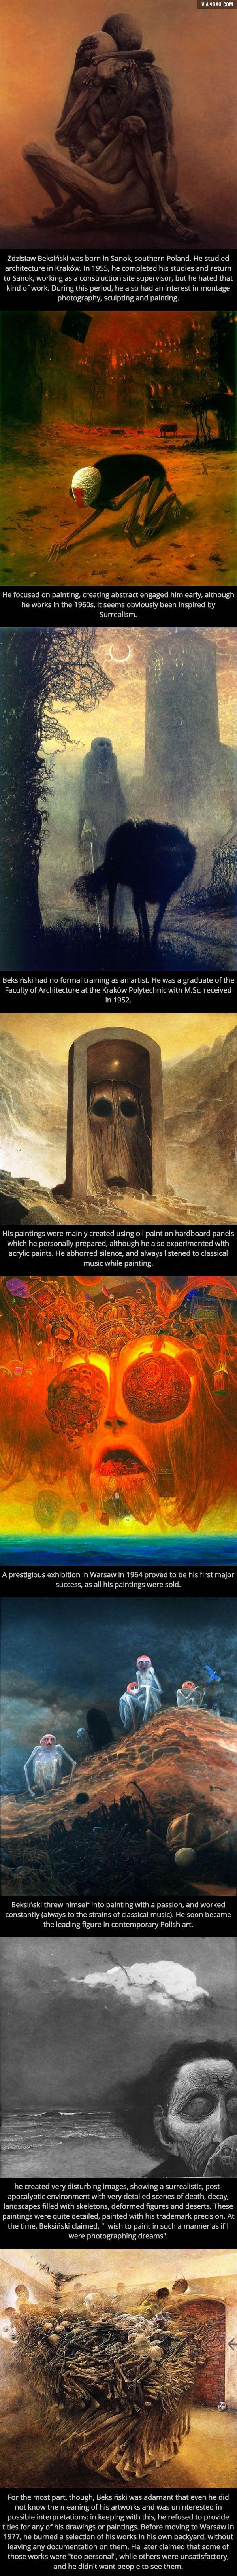 The Beautiful and Horrific Artwork of Zdzisław Beksiński - www.viralpx.com | www.facebook.com/viralpx